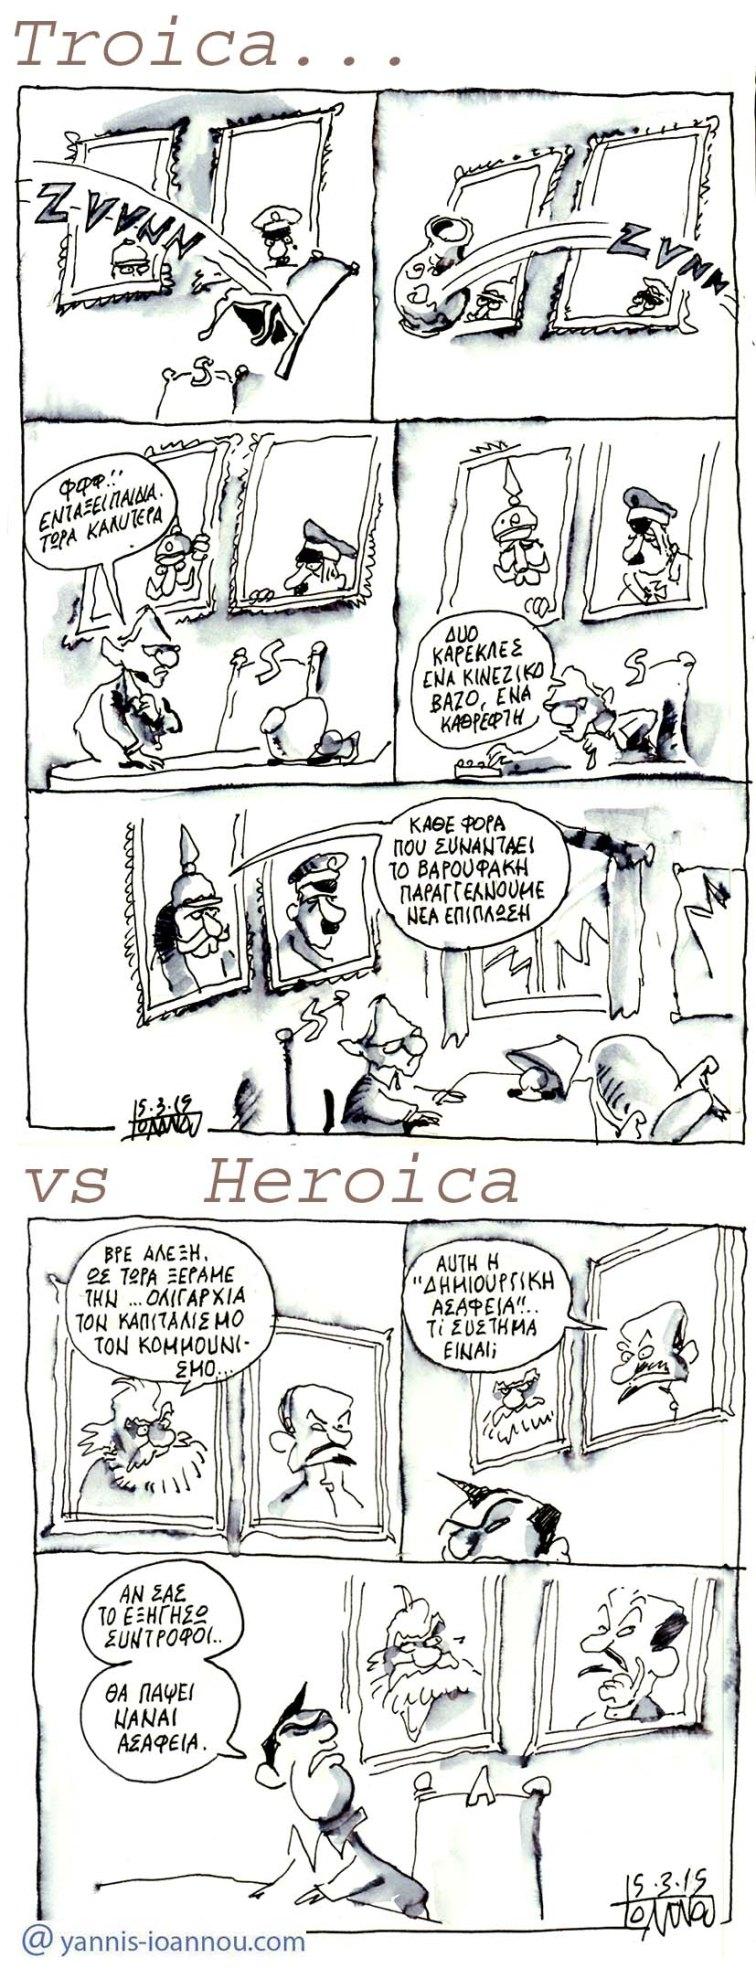 TROICa VS heroica